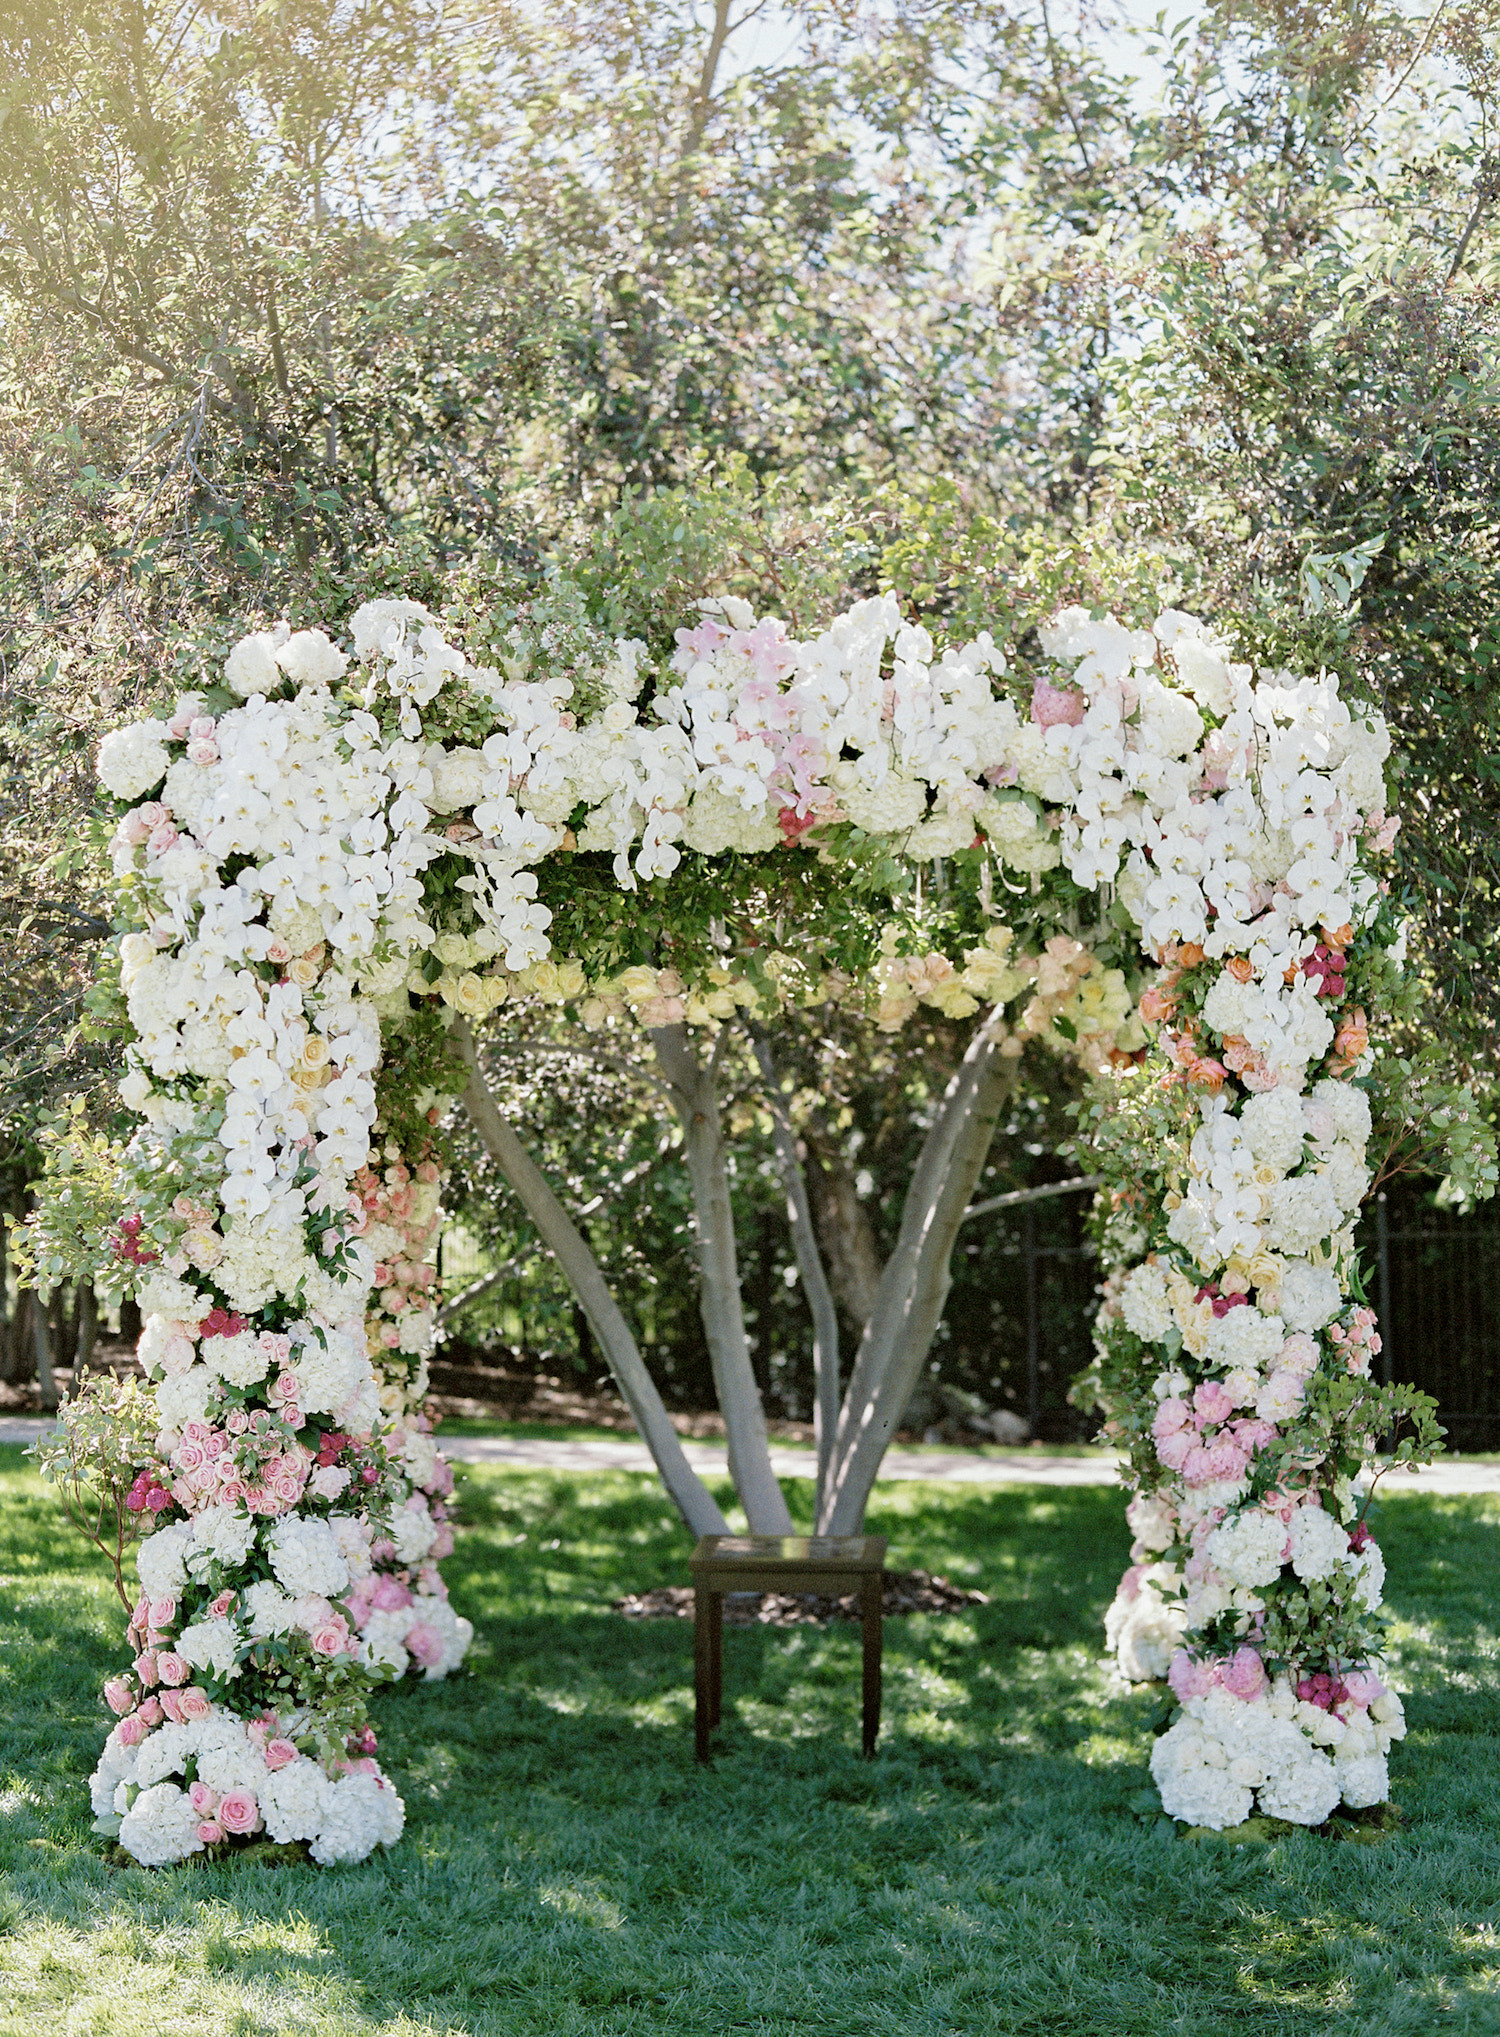 outdoor-wedding-ceremony-arch-floral